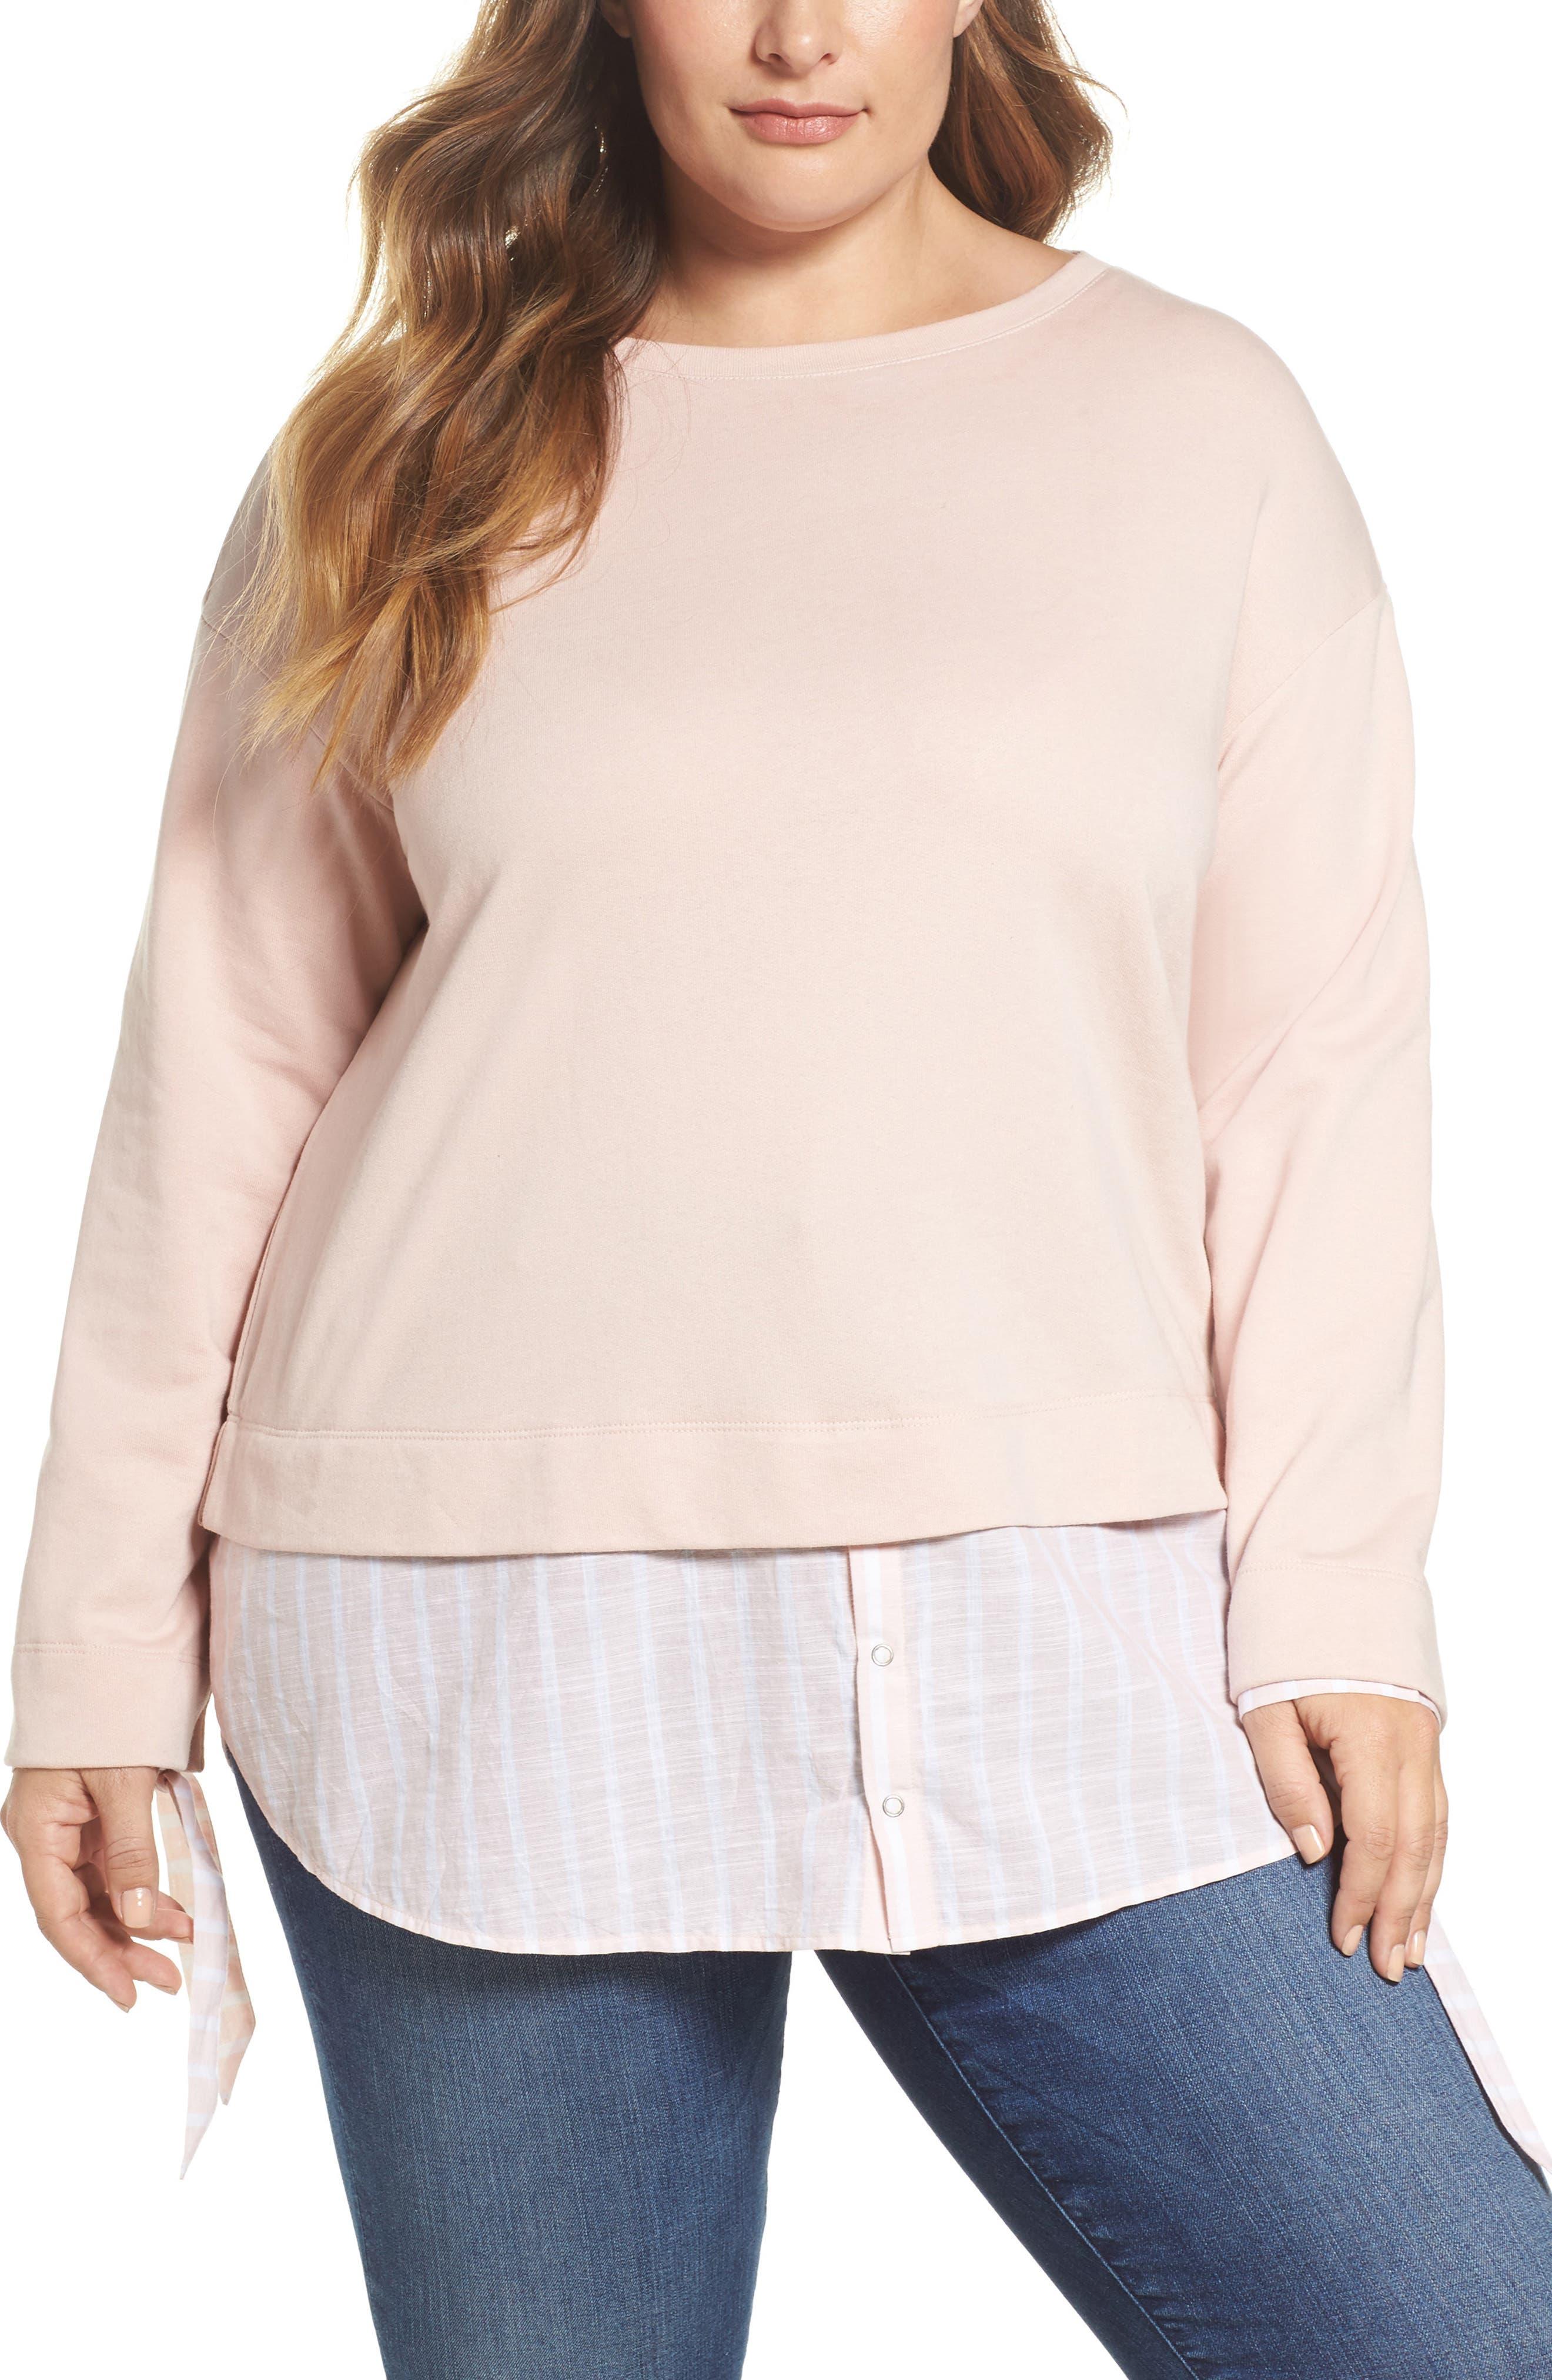 Woven Hem Sweatshirt,                         Main,                         color, Pink- Stripe Colorblock